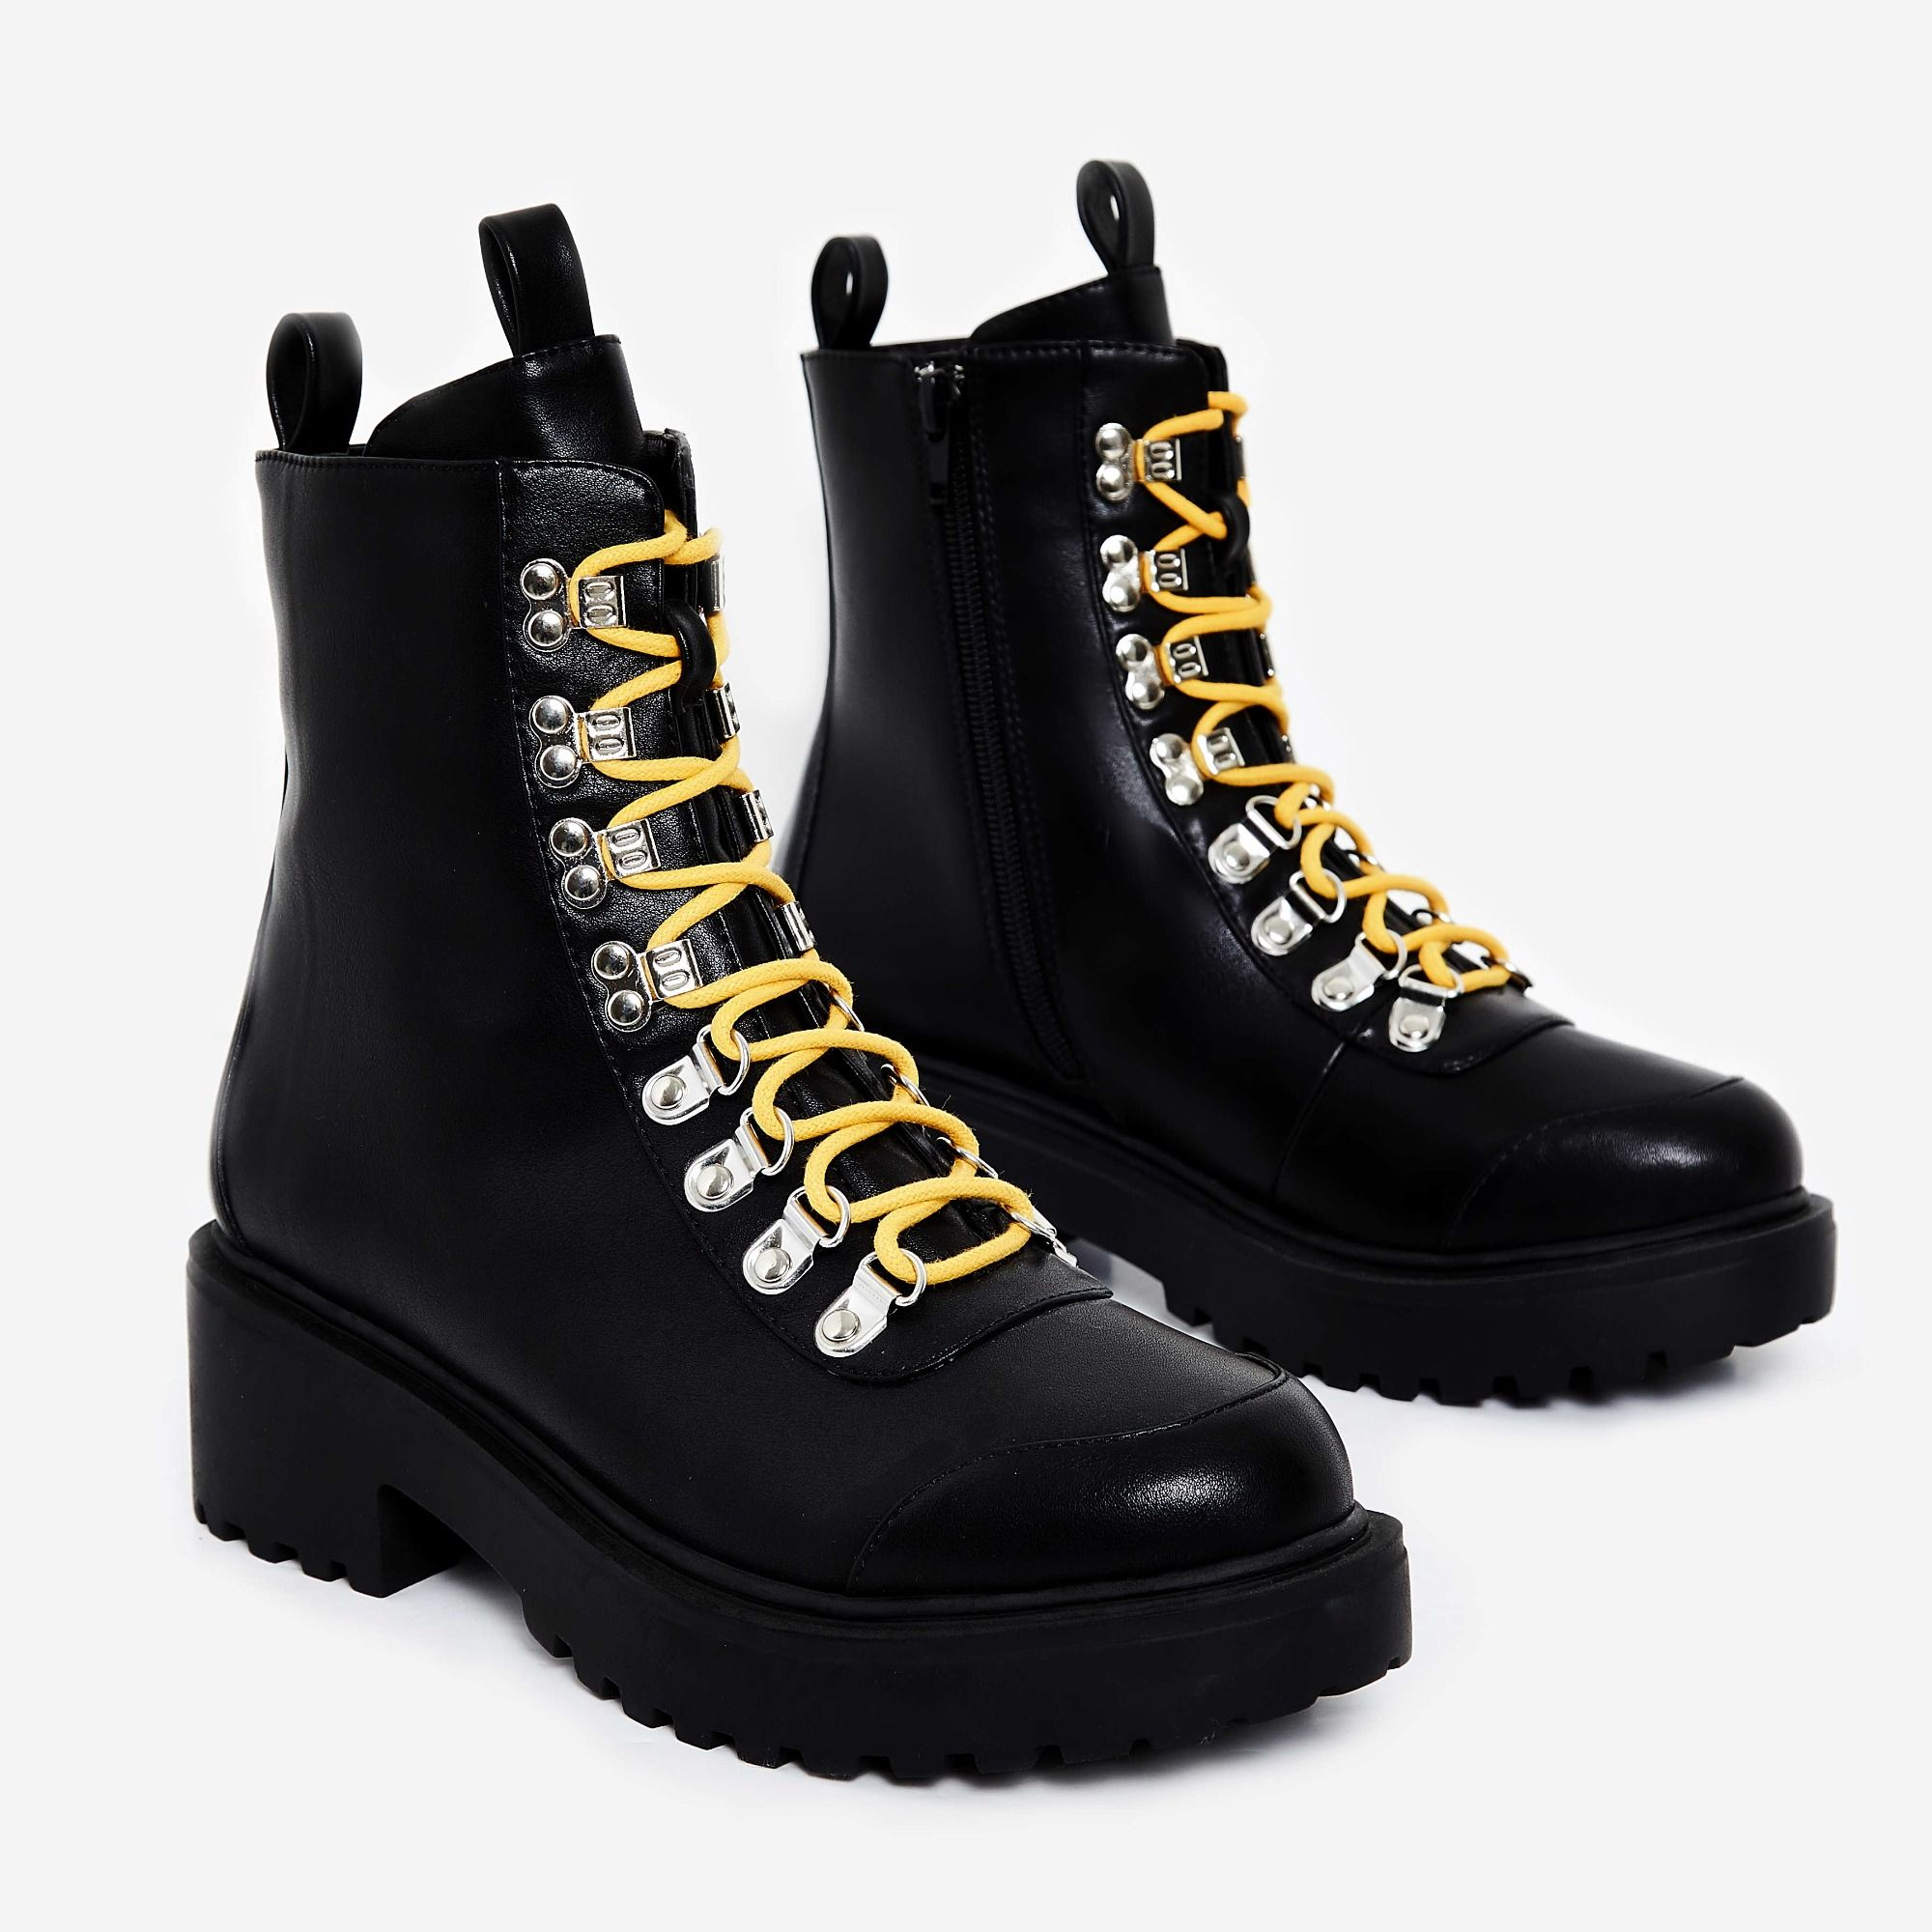 Ego combat boots